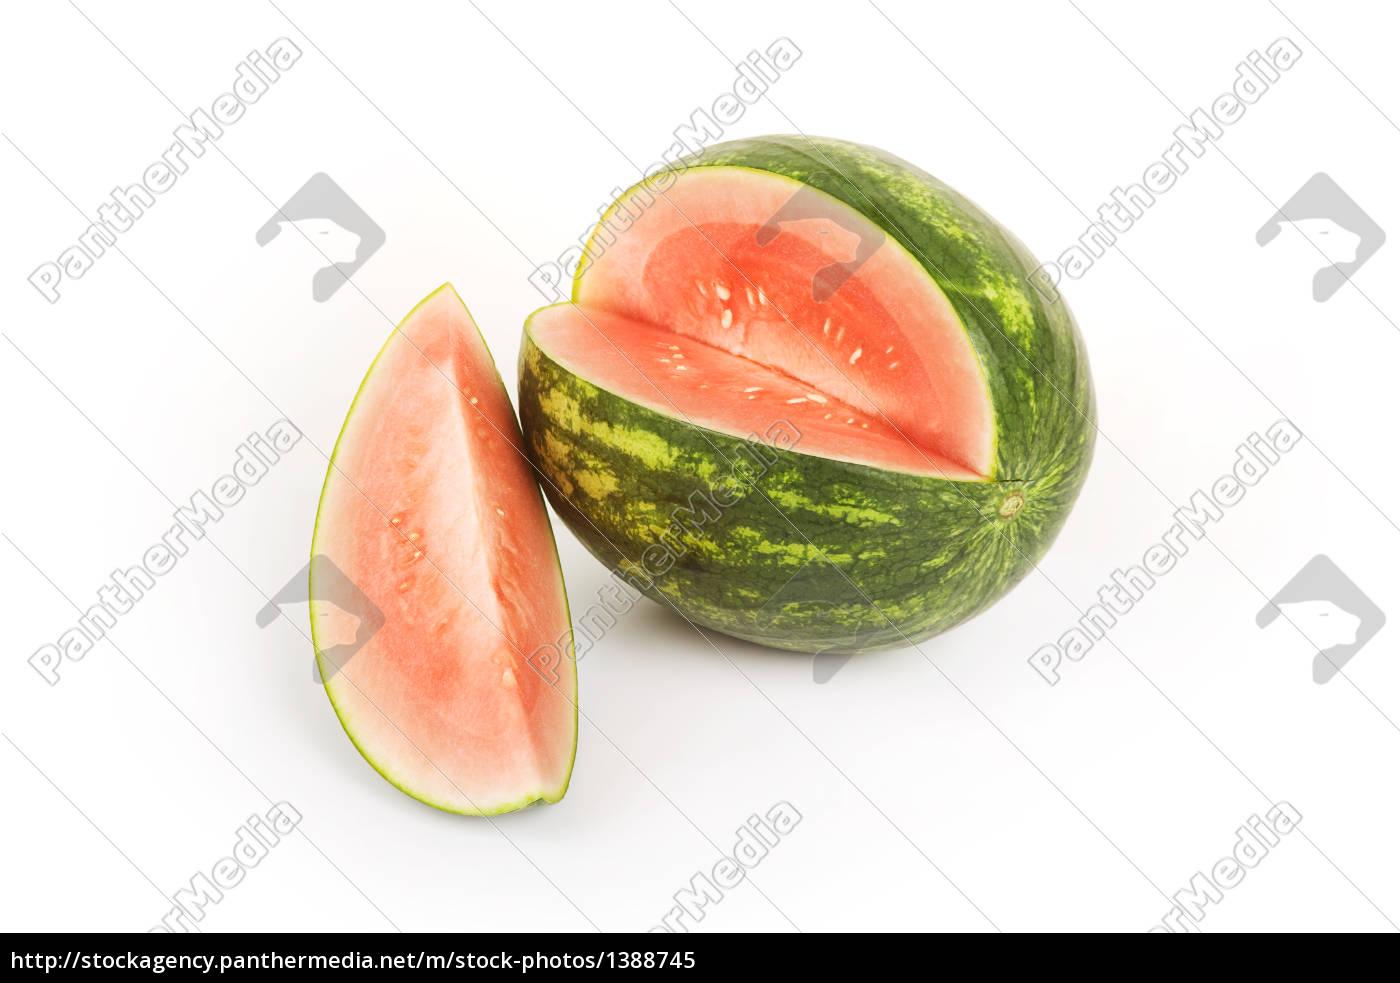 watermelon - 1388745